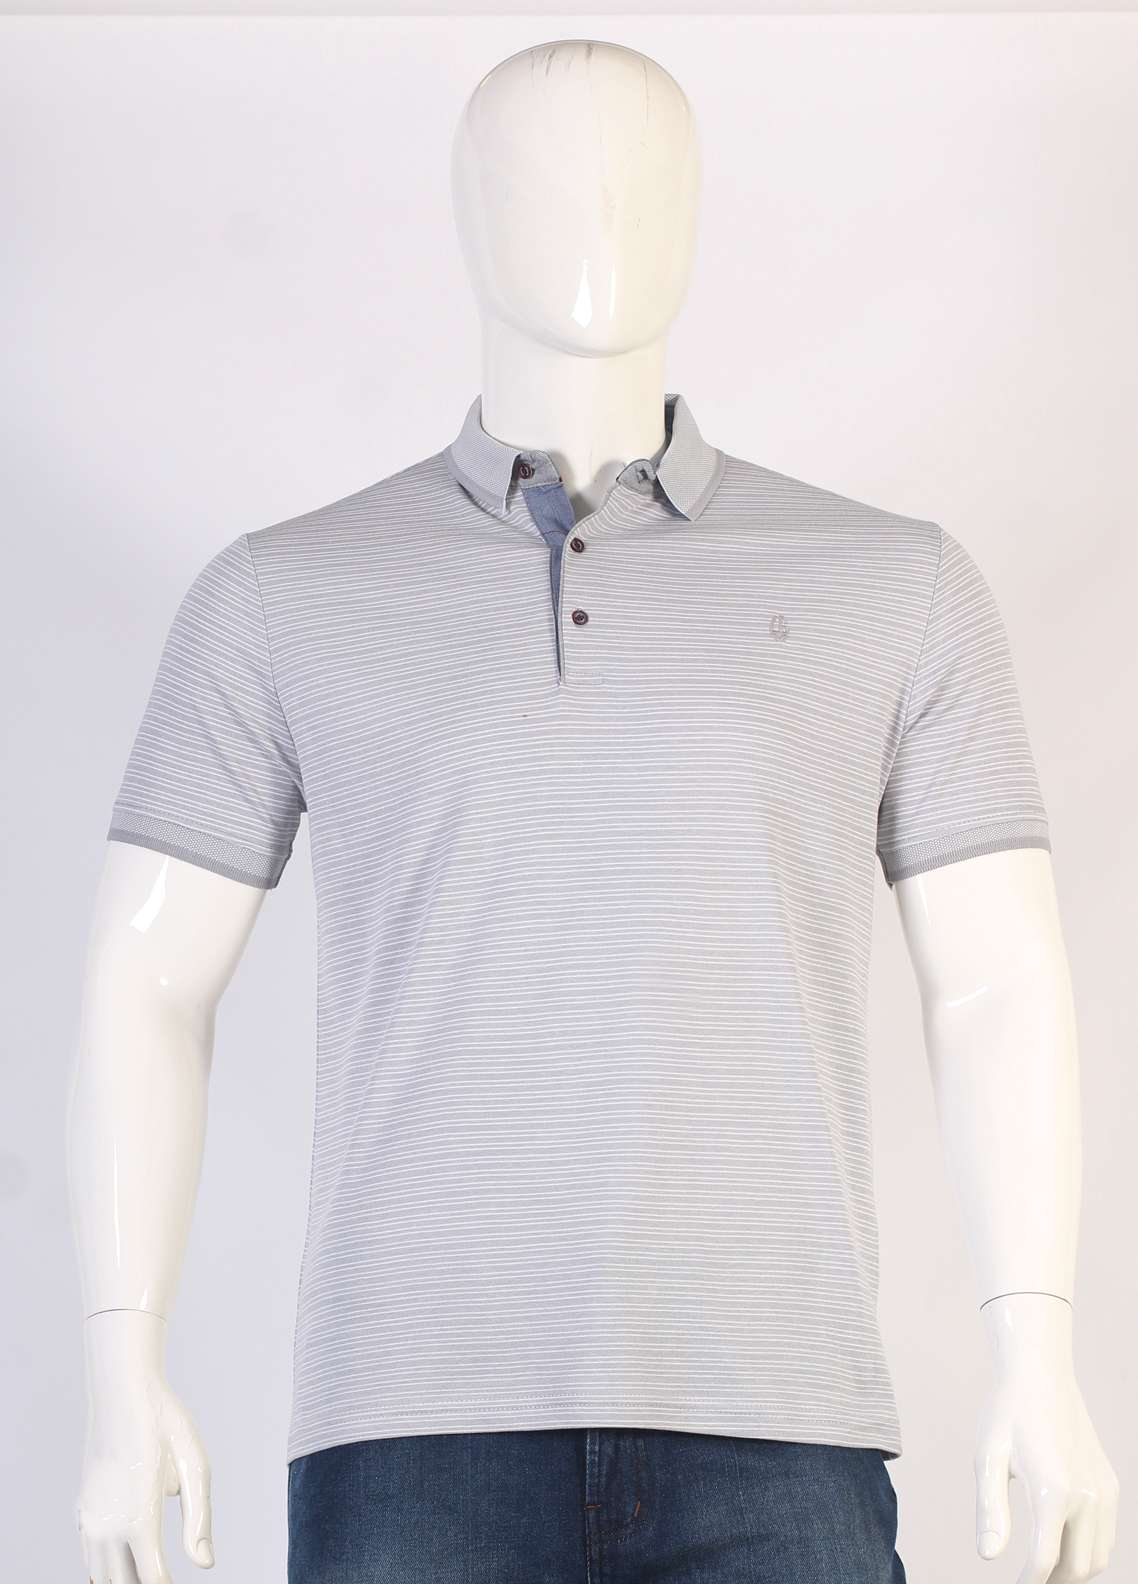 Sanaulla Exclusive Range Jersey Polo Men T-Shirts - Grey TKM18S 361-18